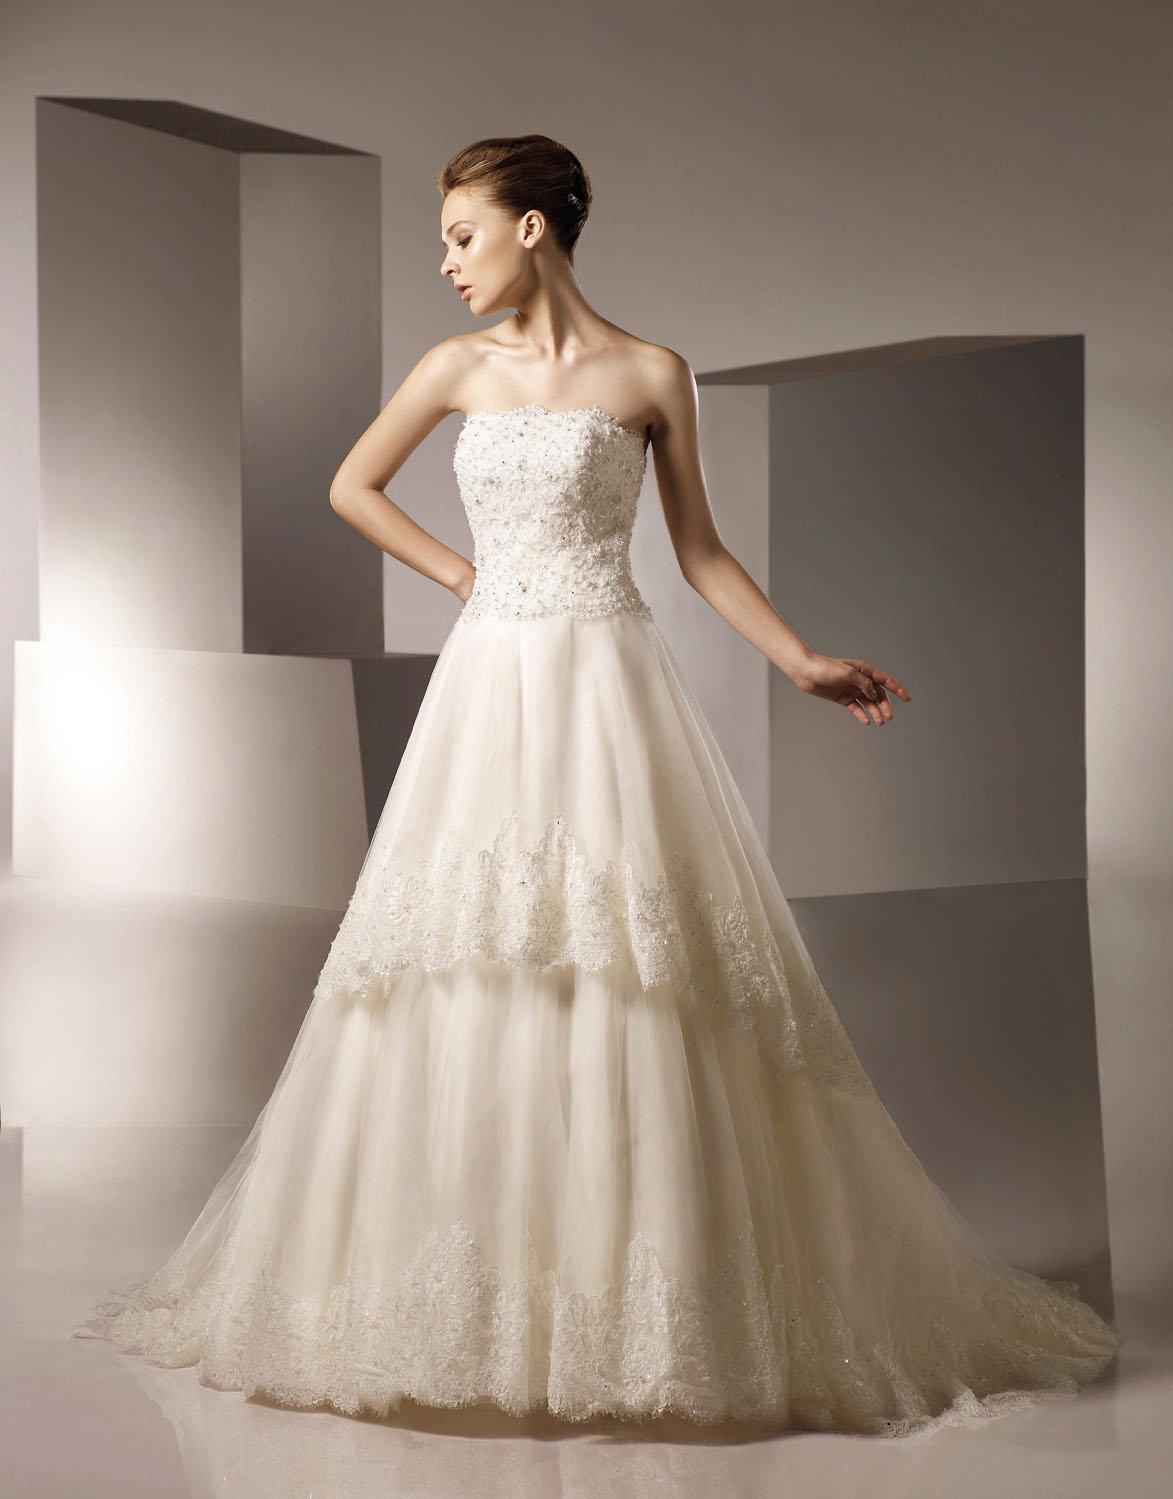 A-line Straight Neckline Appliqued Beading Tuller Wedding Dress Bridal Gown aq0028